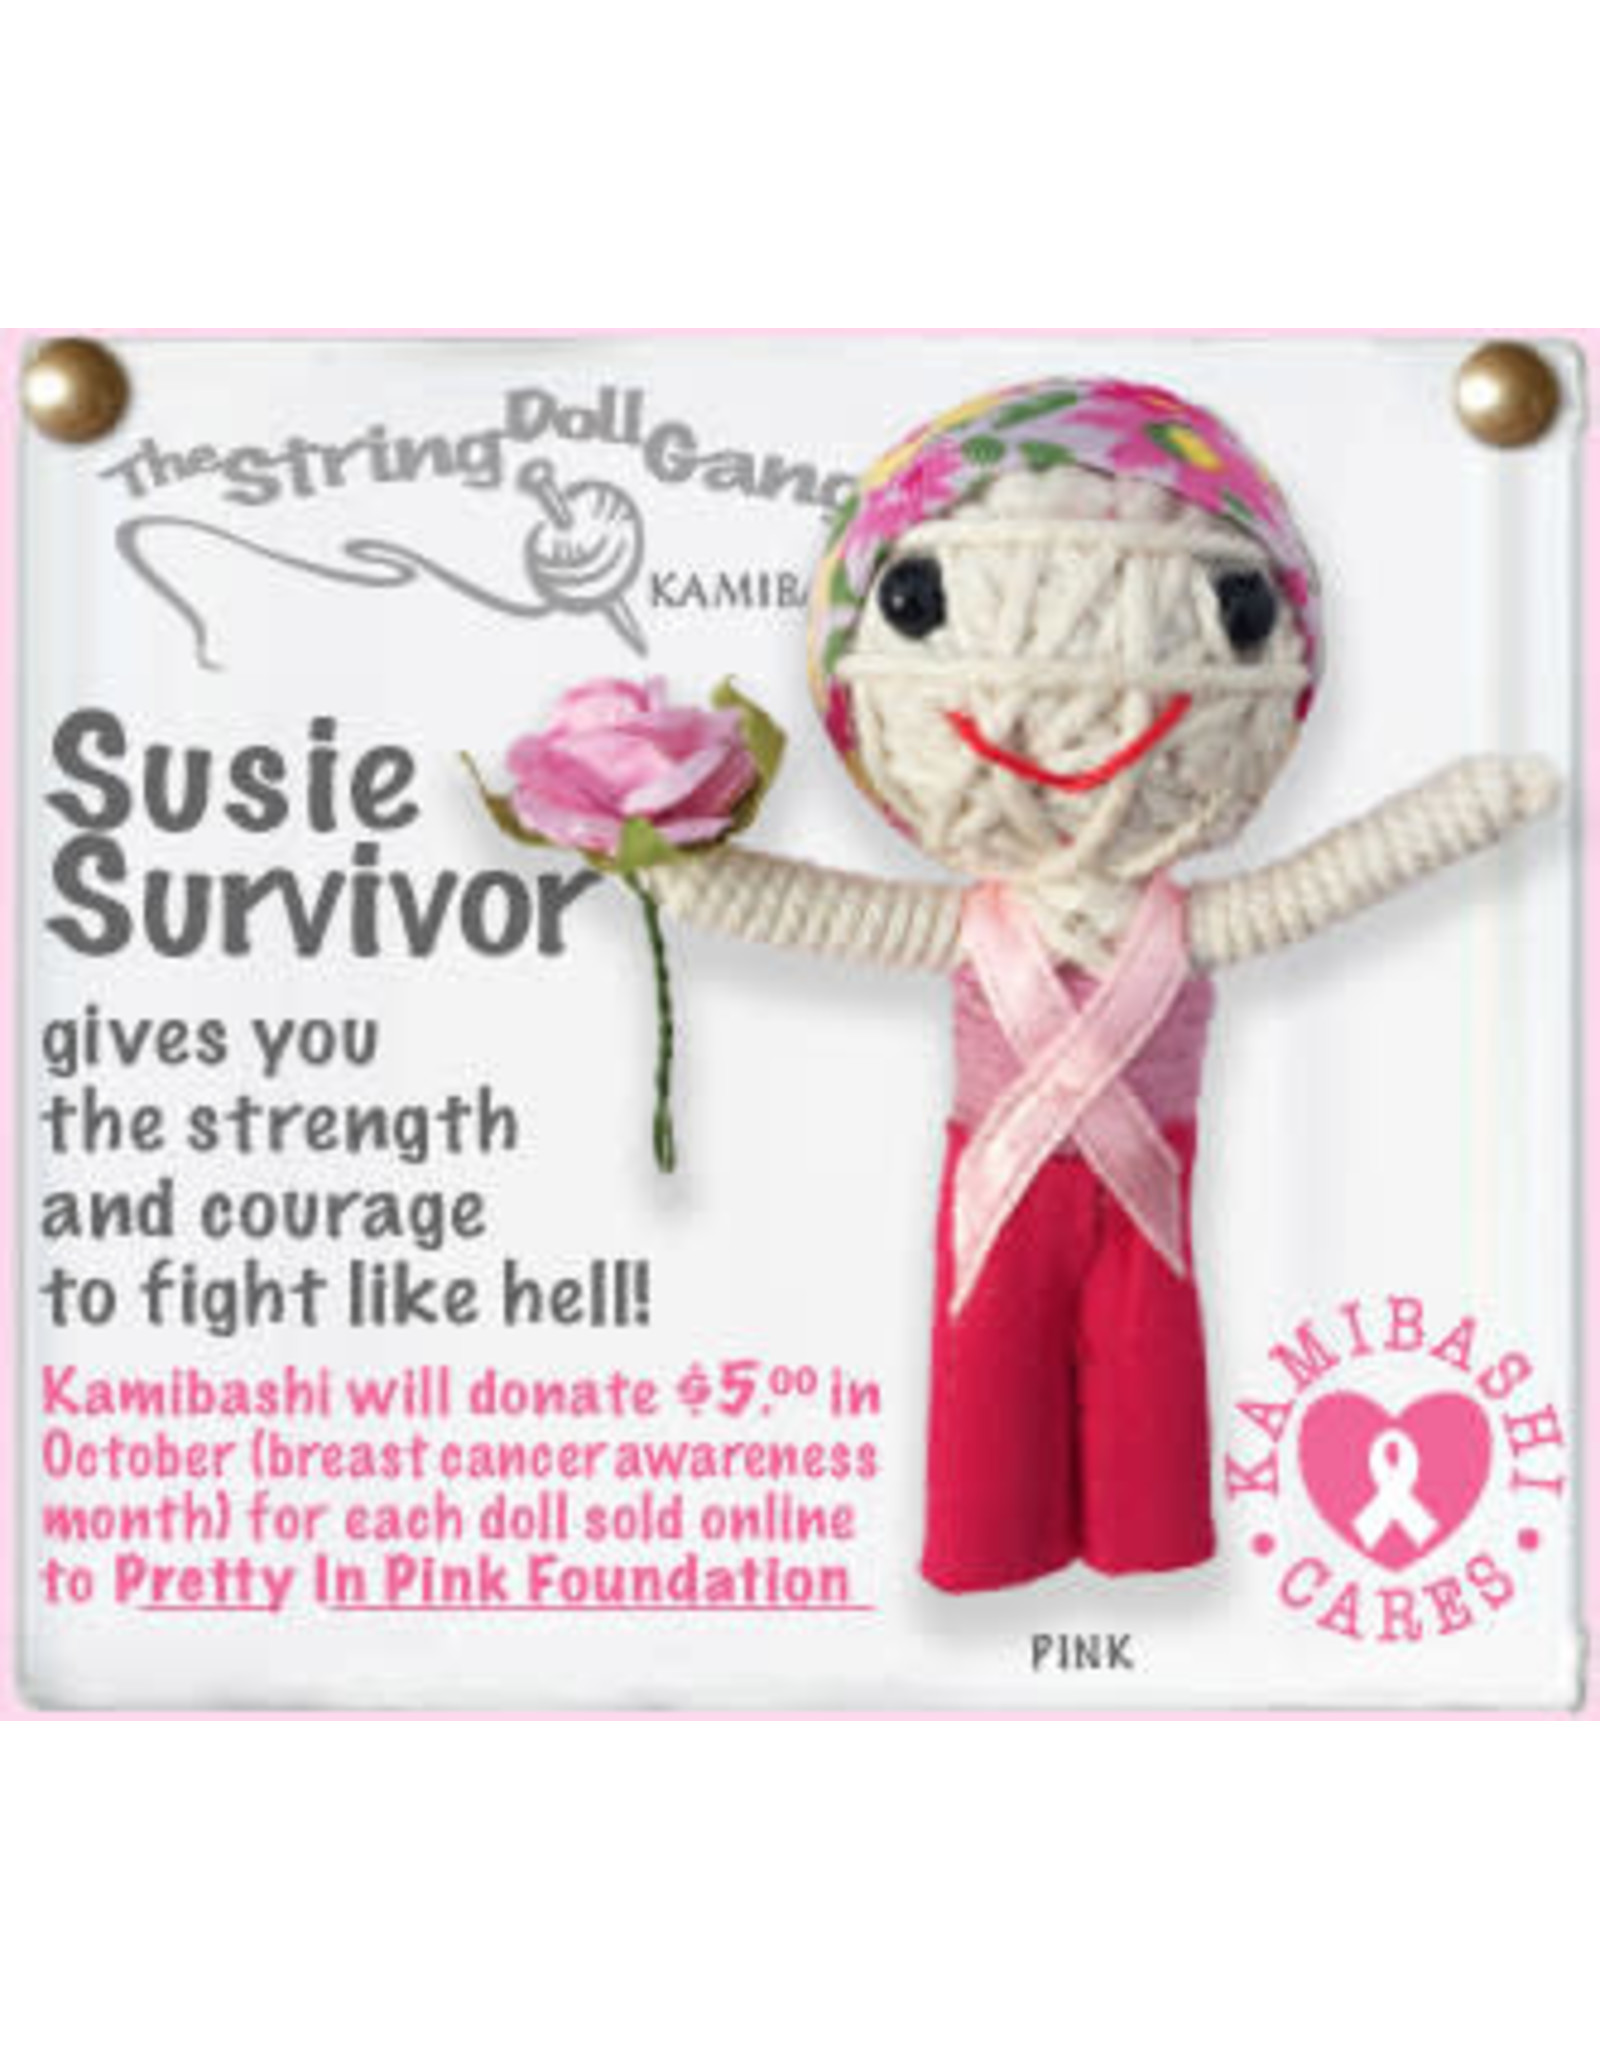 Stringdoll Susie Survivor